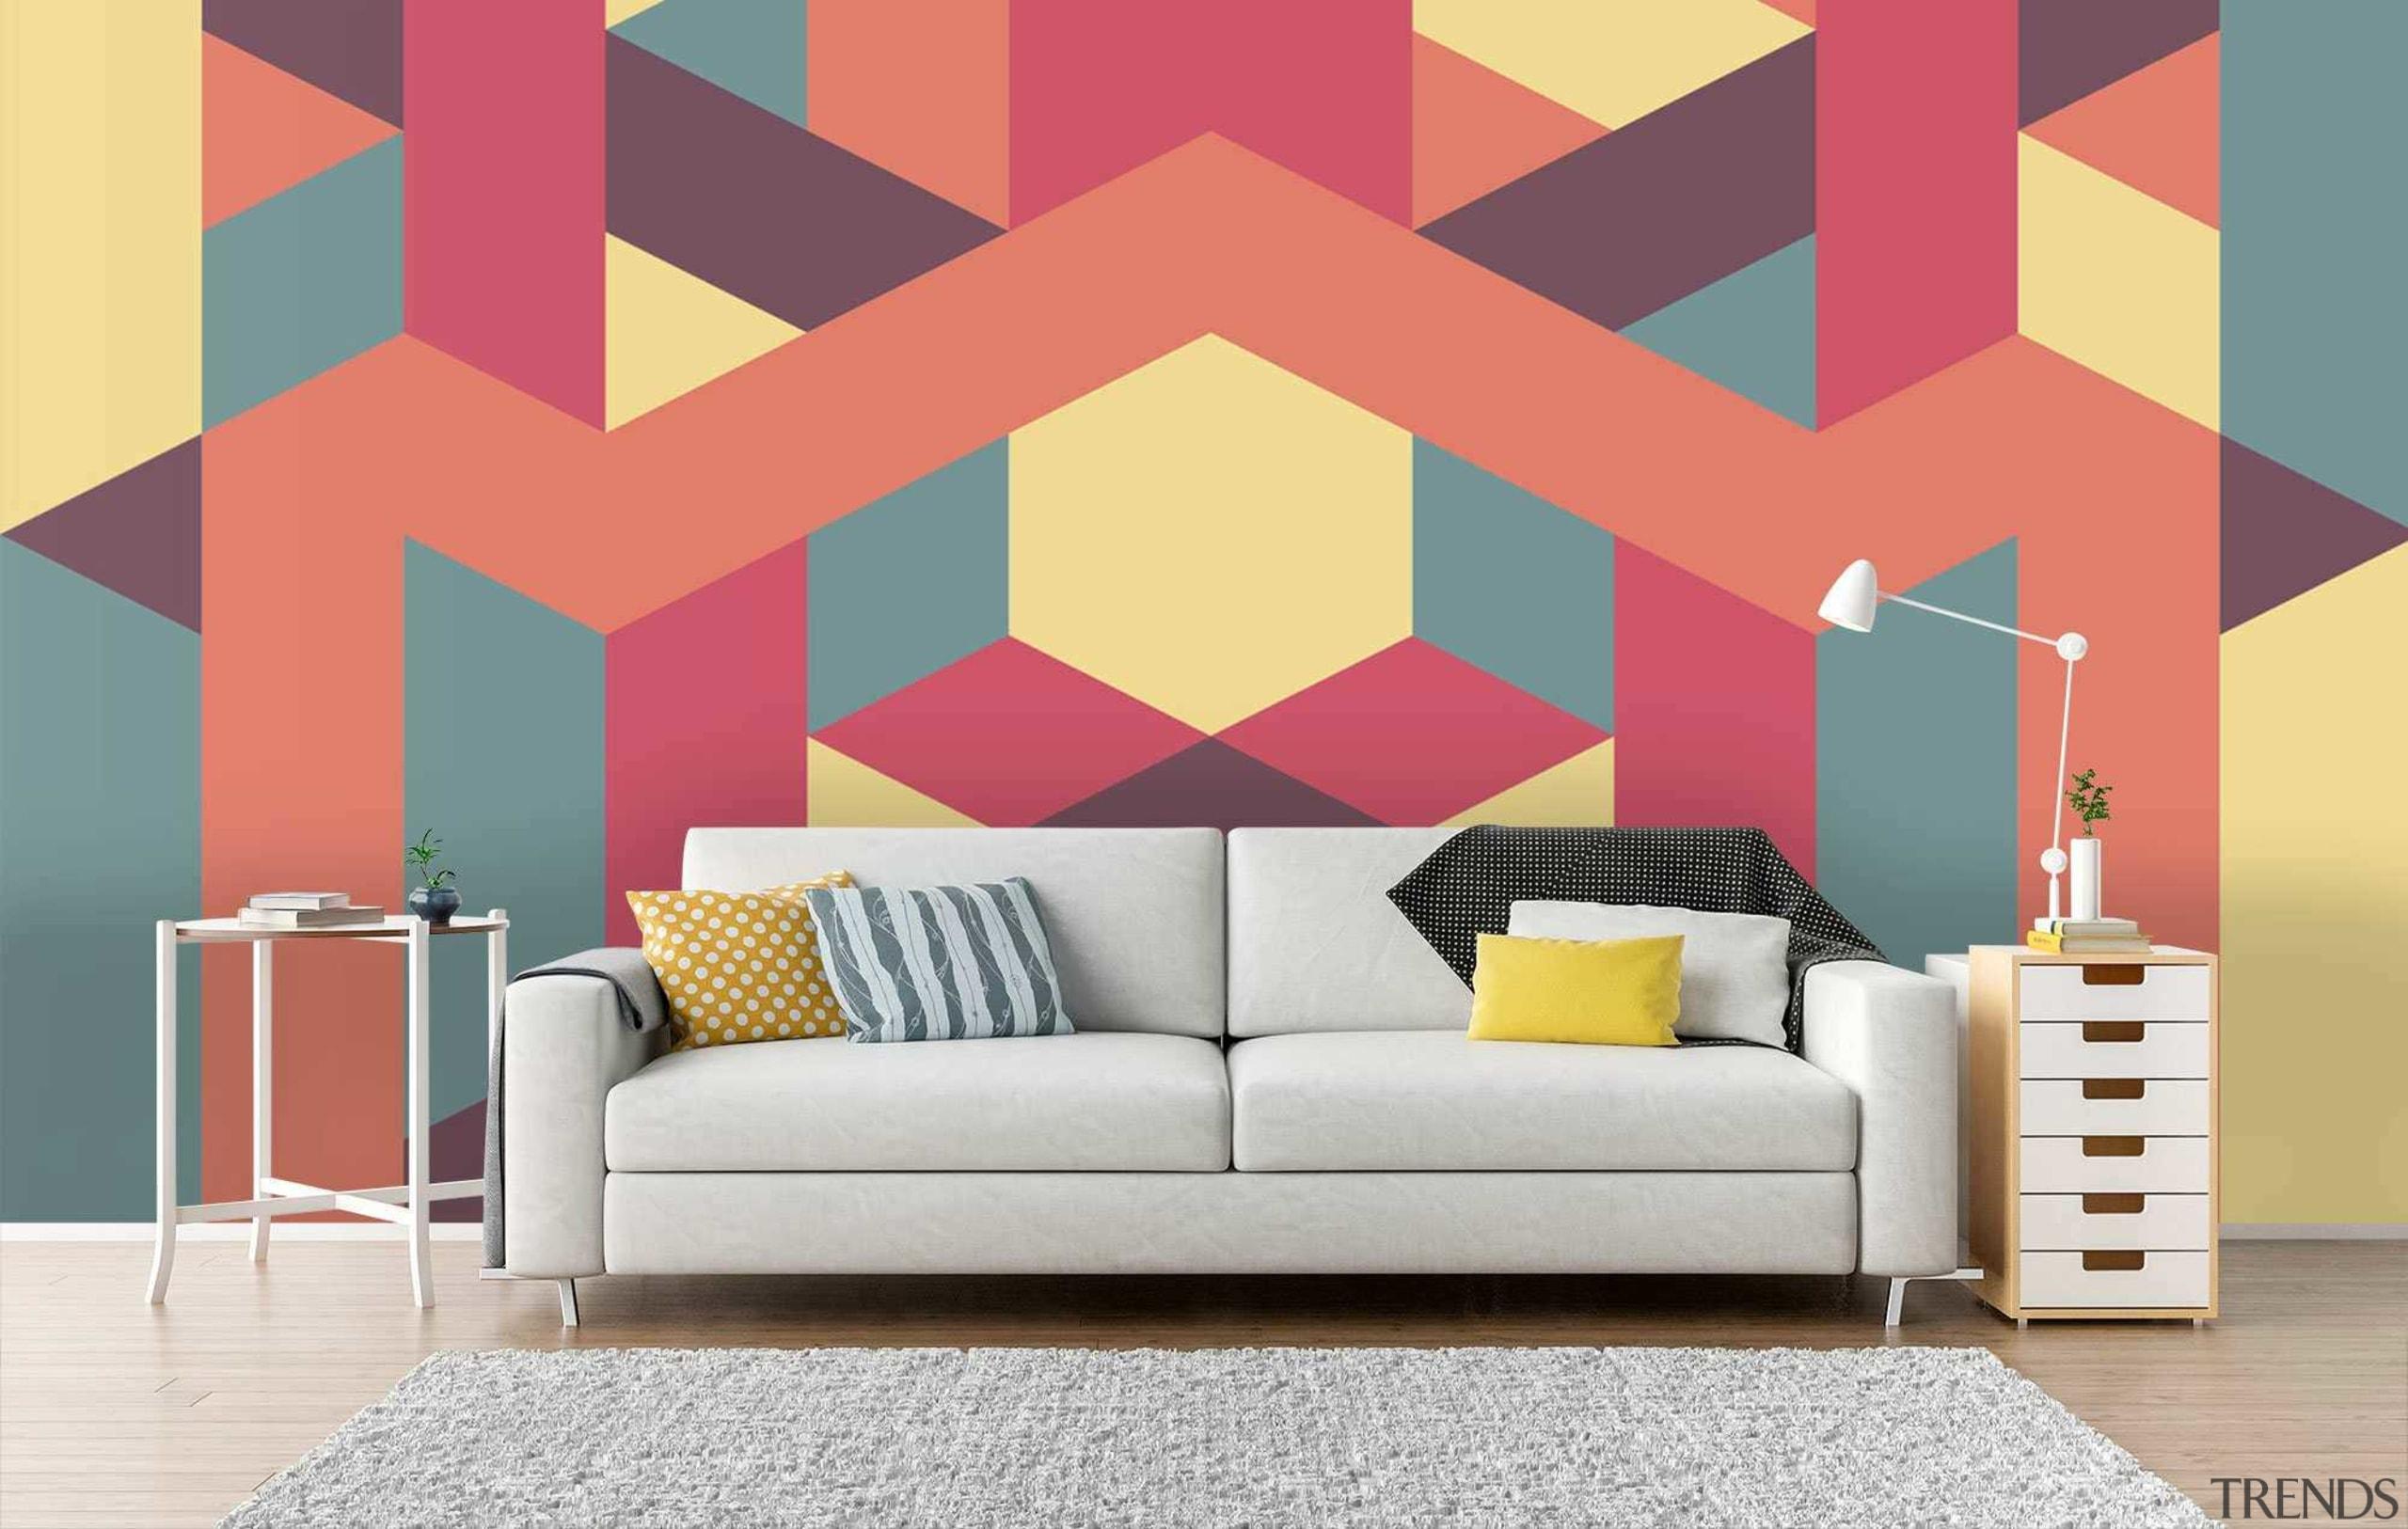 Geometric wallpaper - Geometric wallpaper - interior design interior design, living room, pattern, wall, wallpaper, red, white